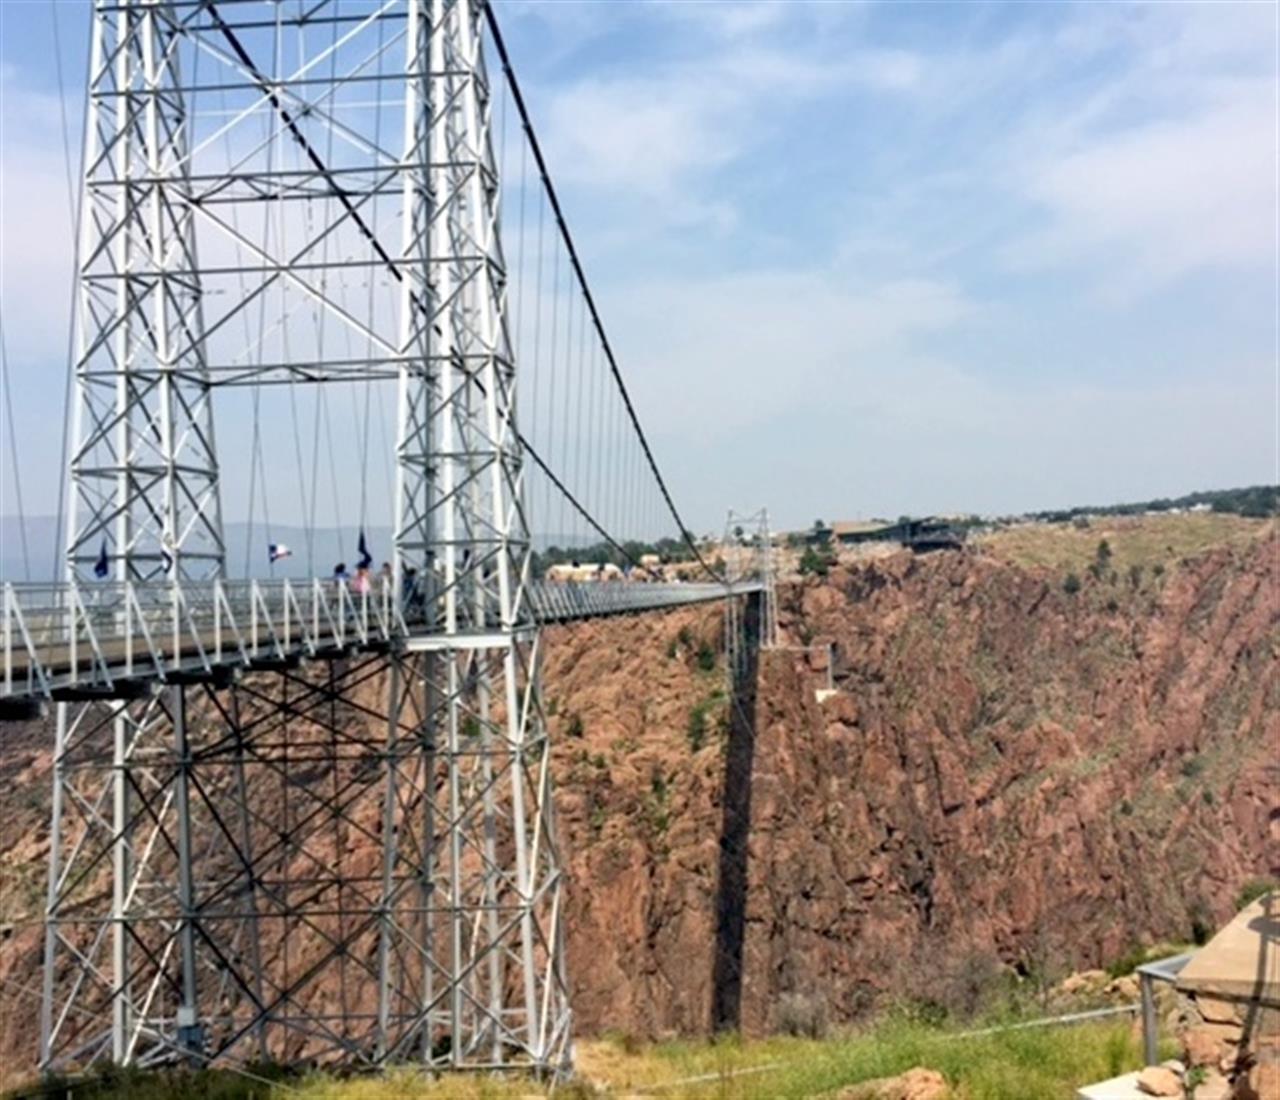 Royal Gorge Bridge, Canon City CO - Highest suspension bridge in North America.